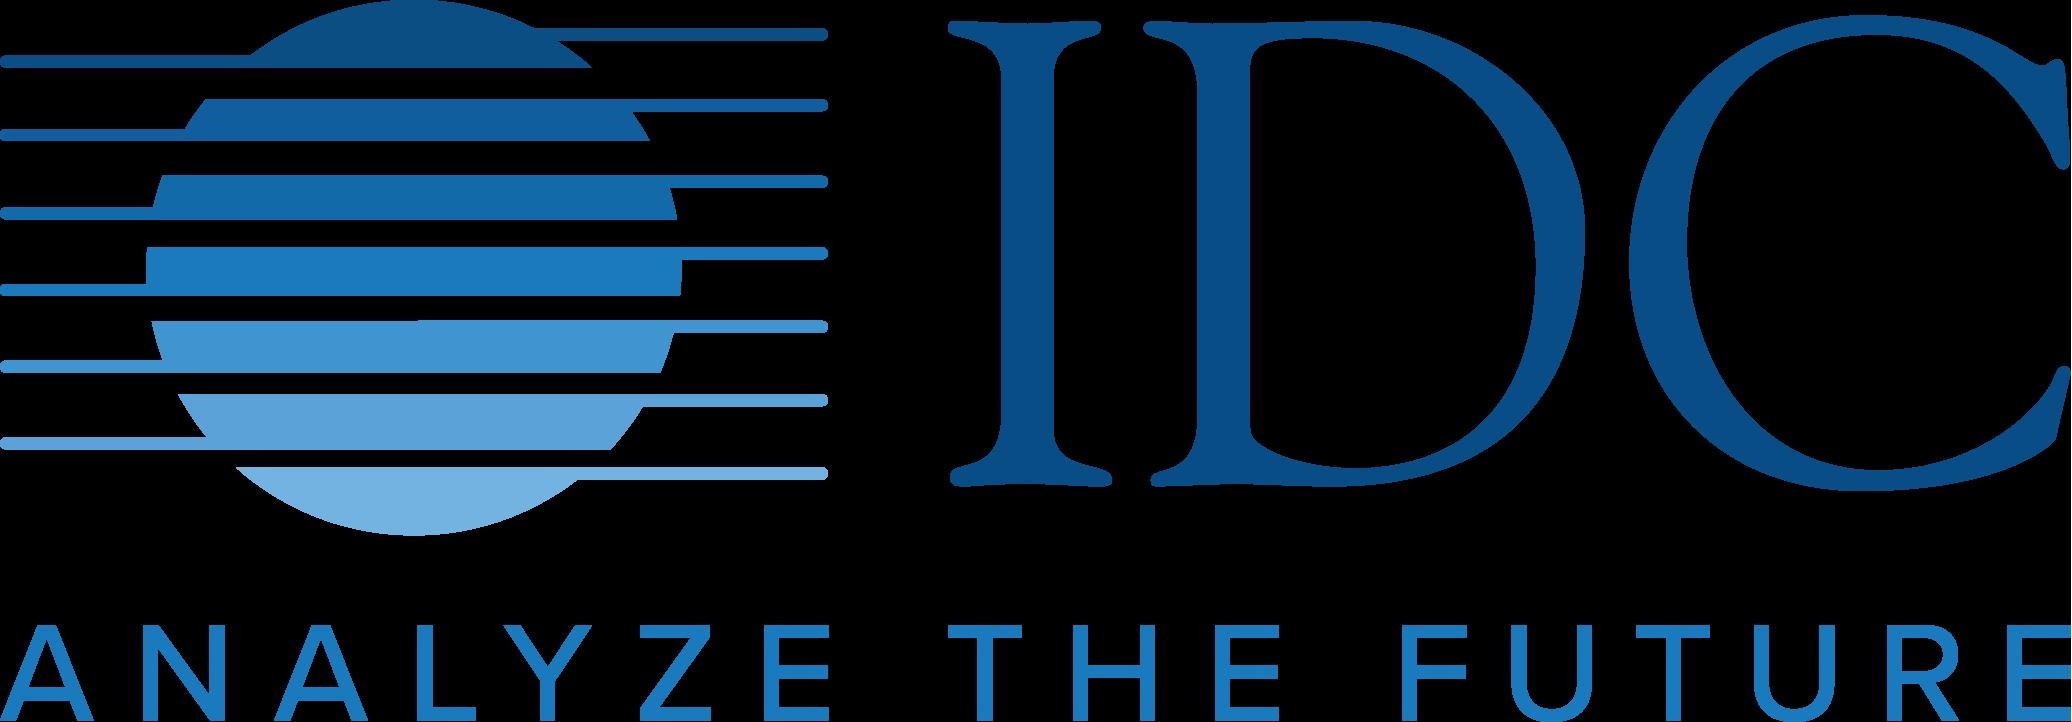 IDC-logo-2017-vertical-fullcolor-2072x722